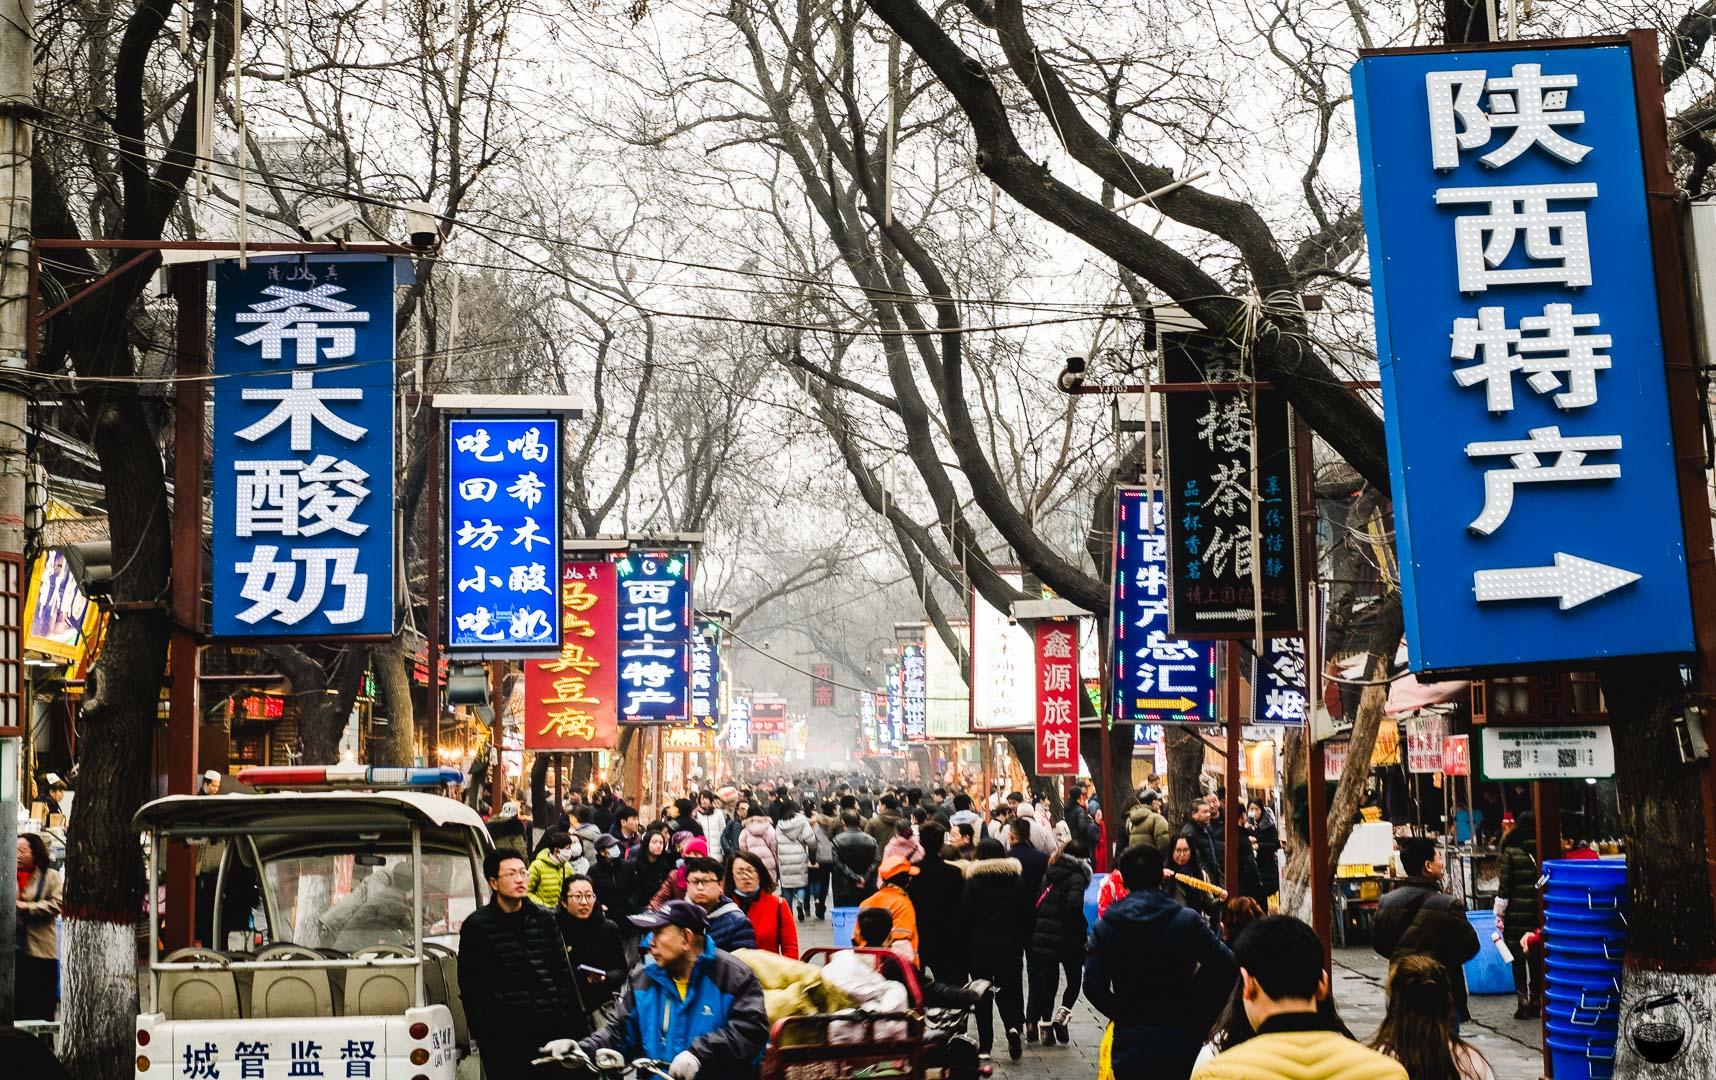 Hui Min Jie Xi'an Muslim Street Food